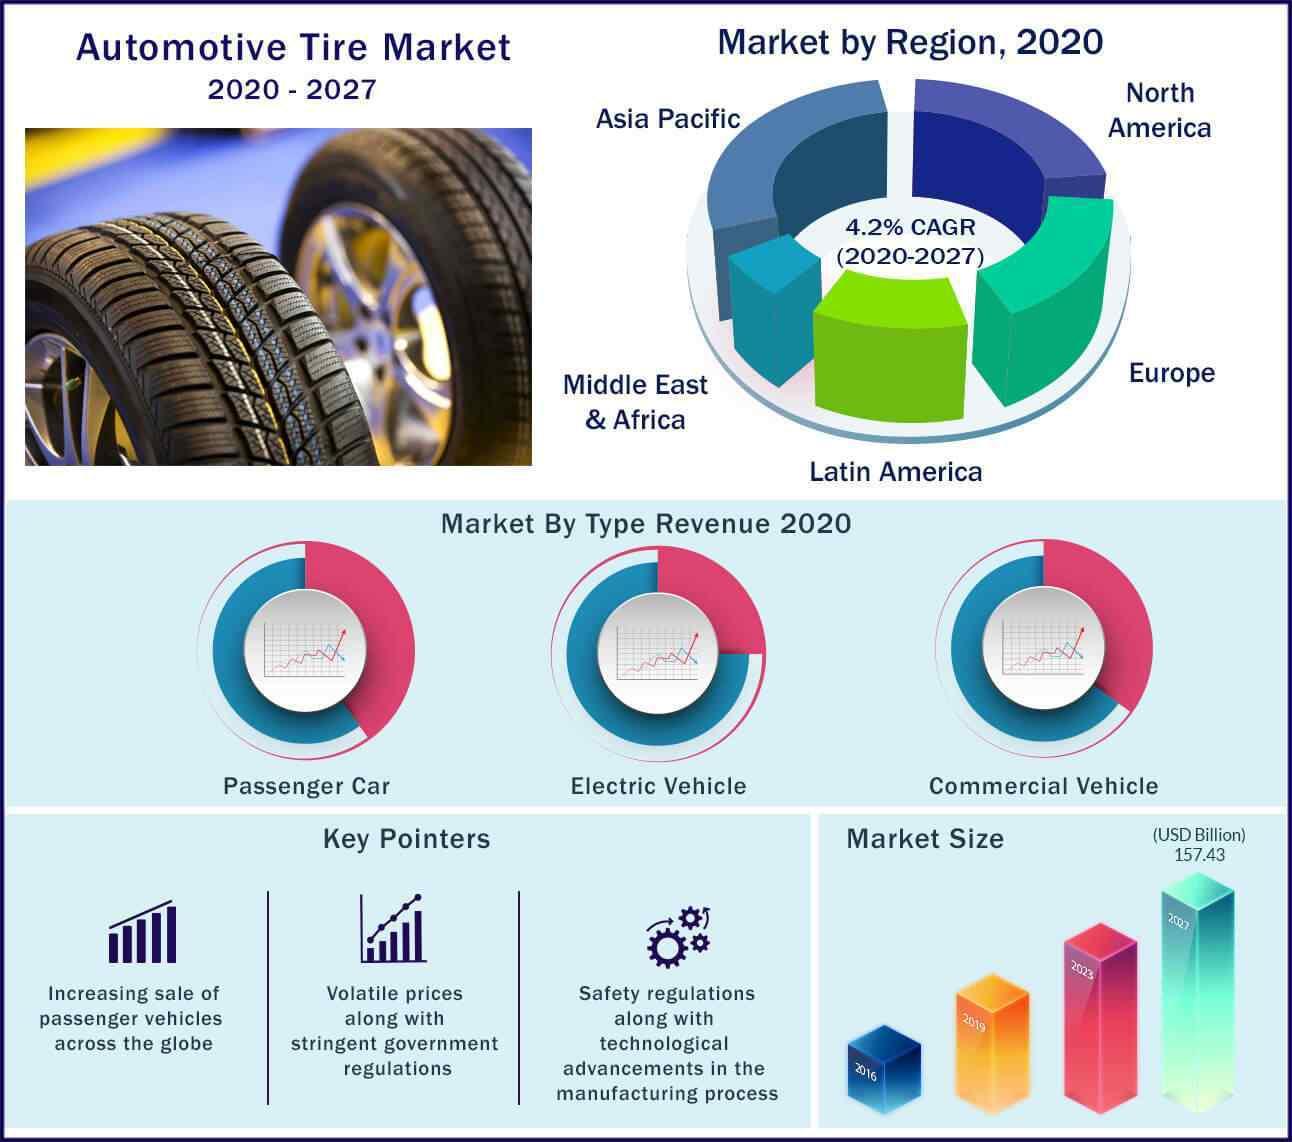 Global Automotive Tire Market 2020-2027